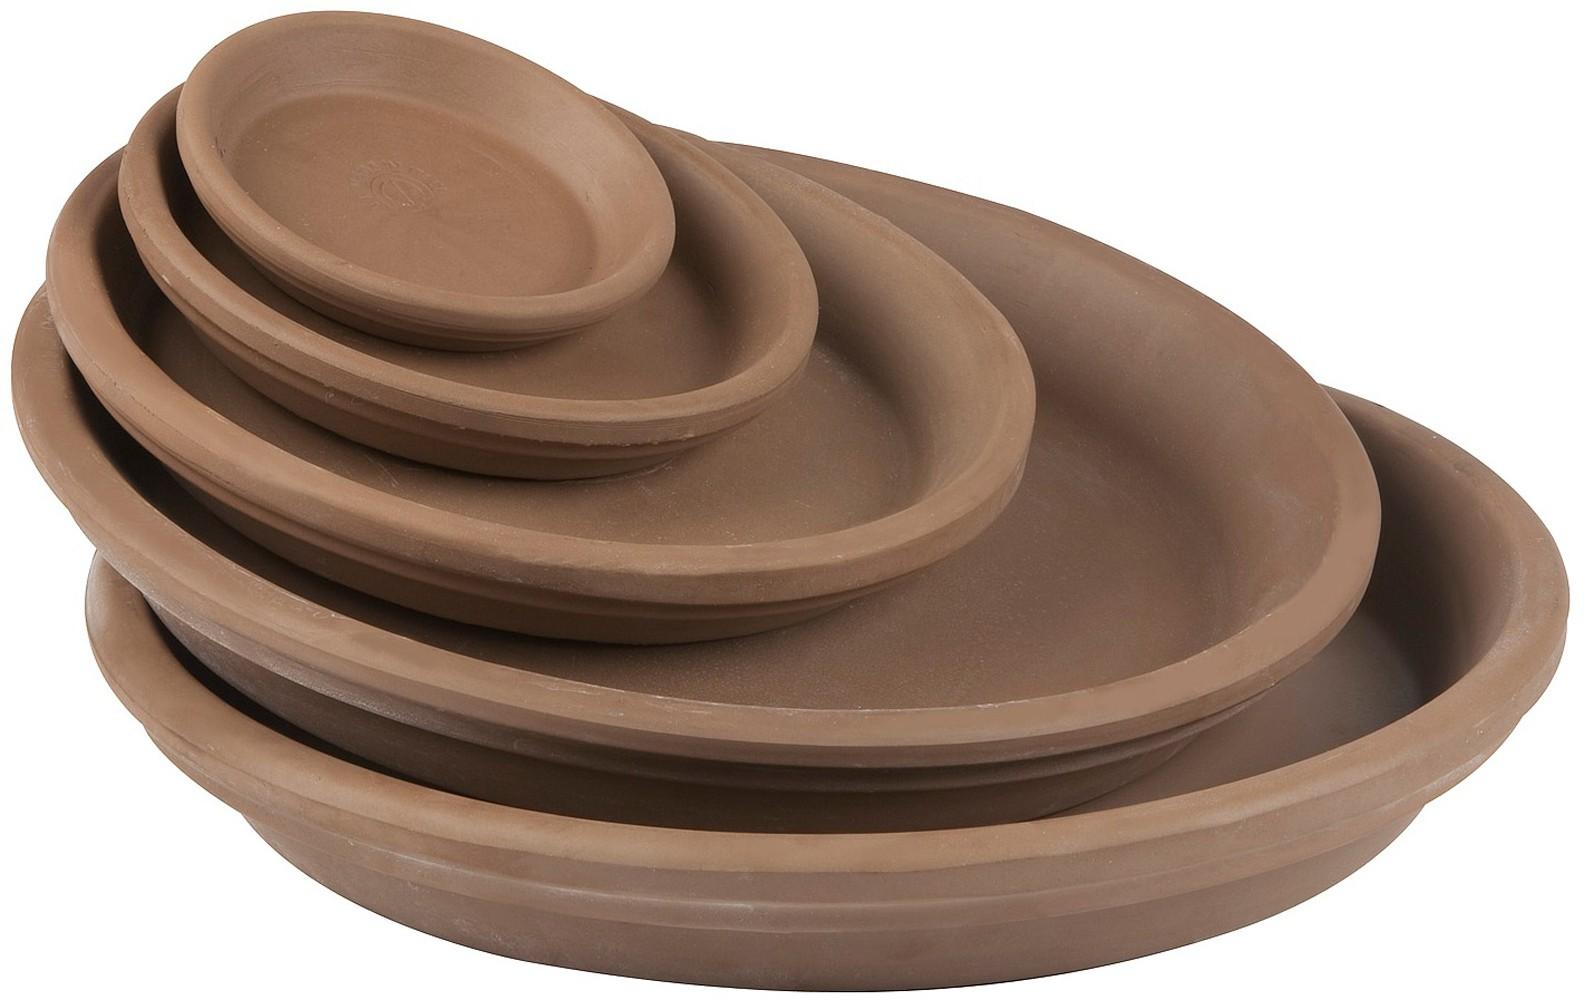 New England Pottery 100012783